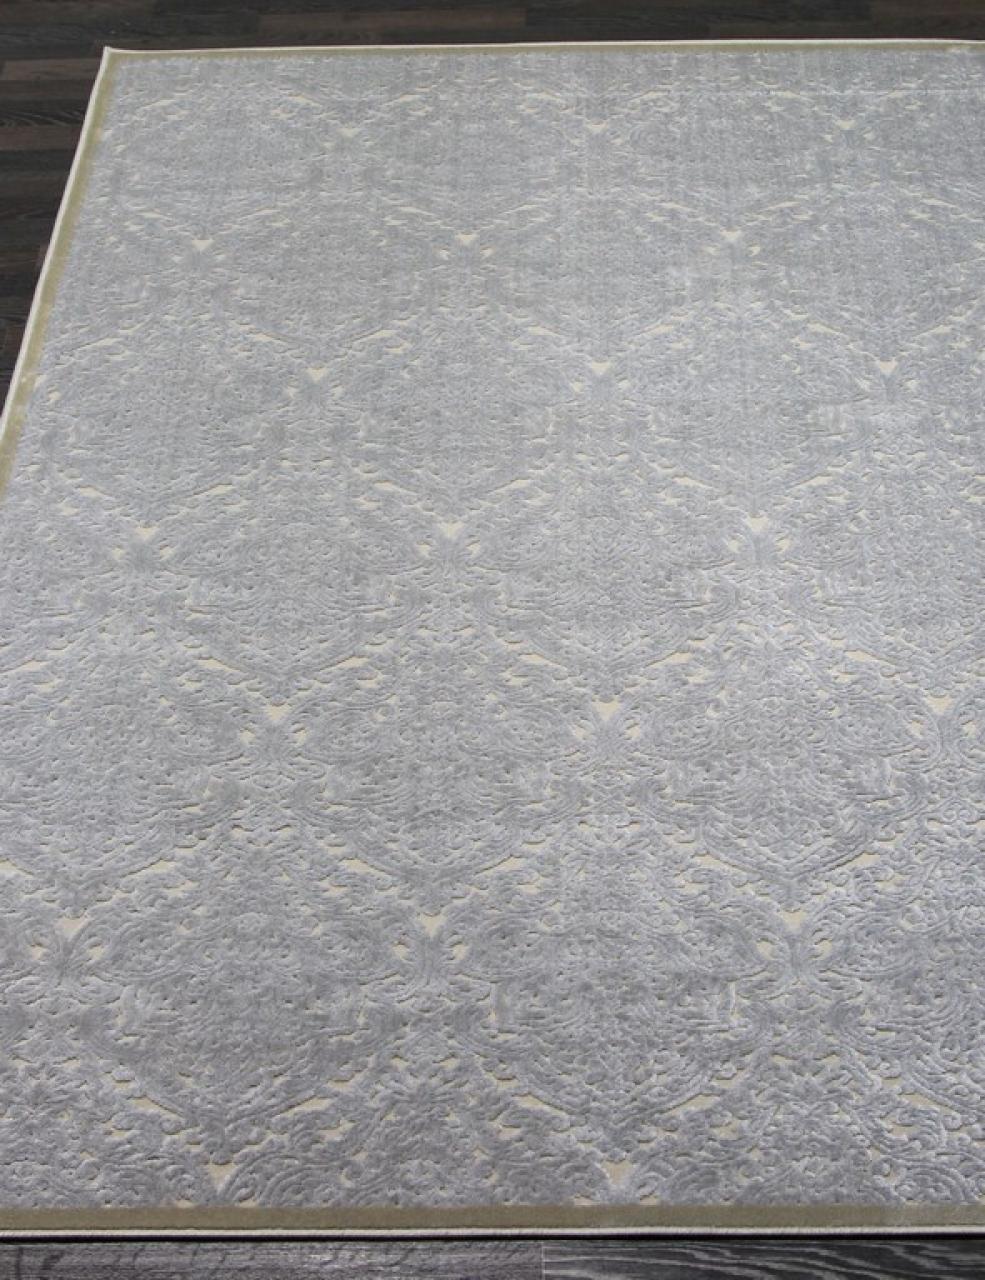 Ковер 0VC981 - ICE BEIGE - Прямоугольник - коллекция TIFFANY - фото 1